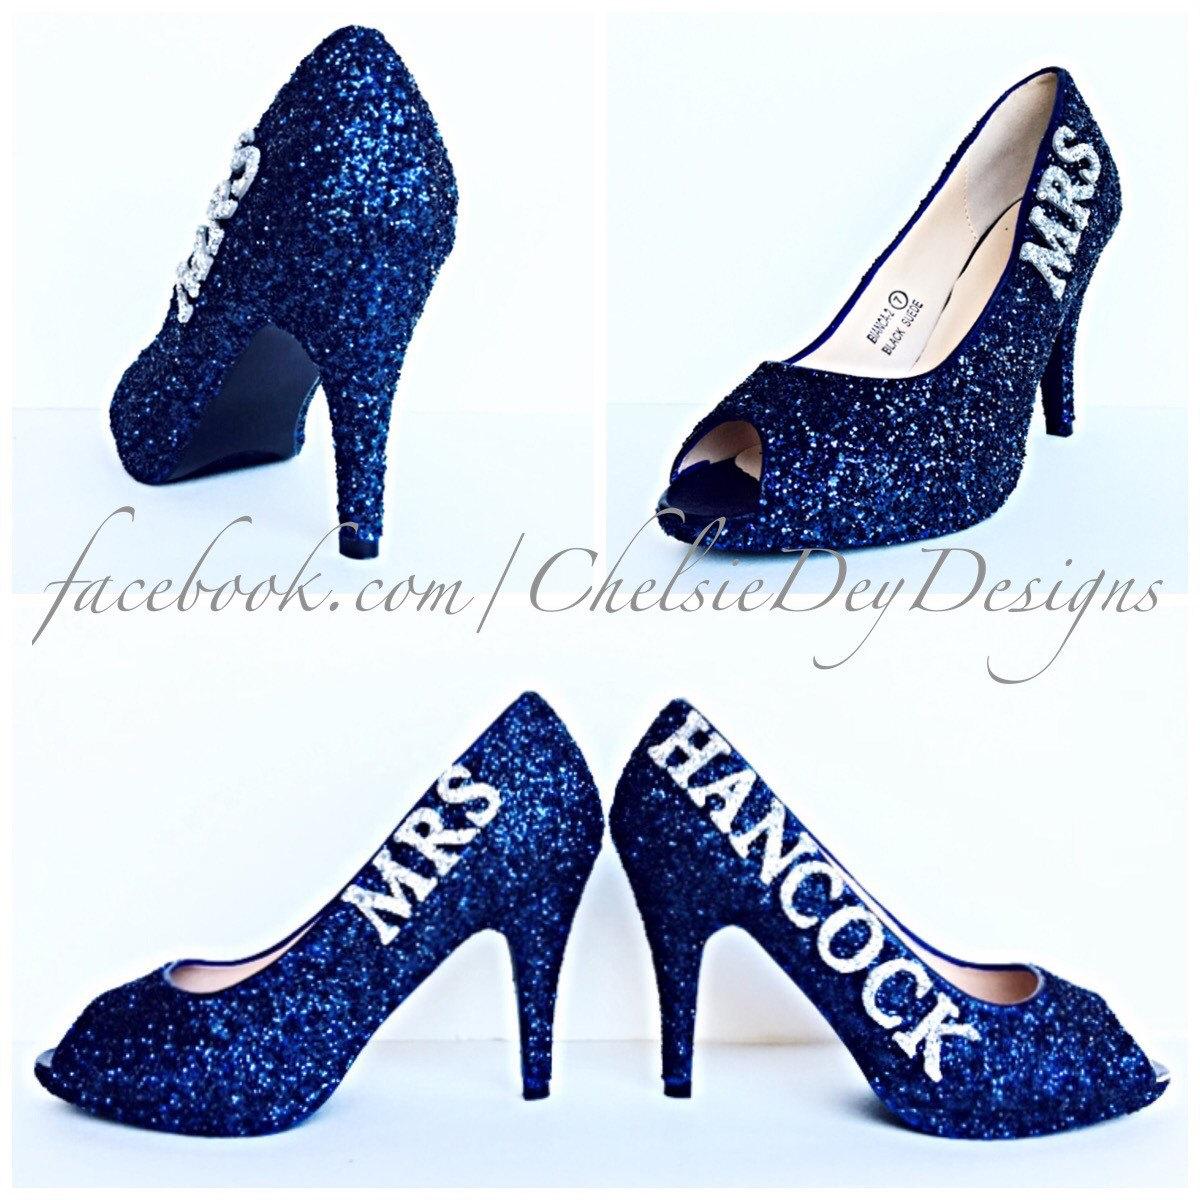 e089103fb24 Glitter High Heels - Navy Blue and Silver Peep Toe Pumps - Wedding ...